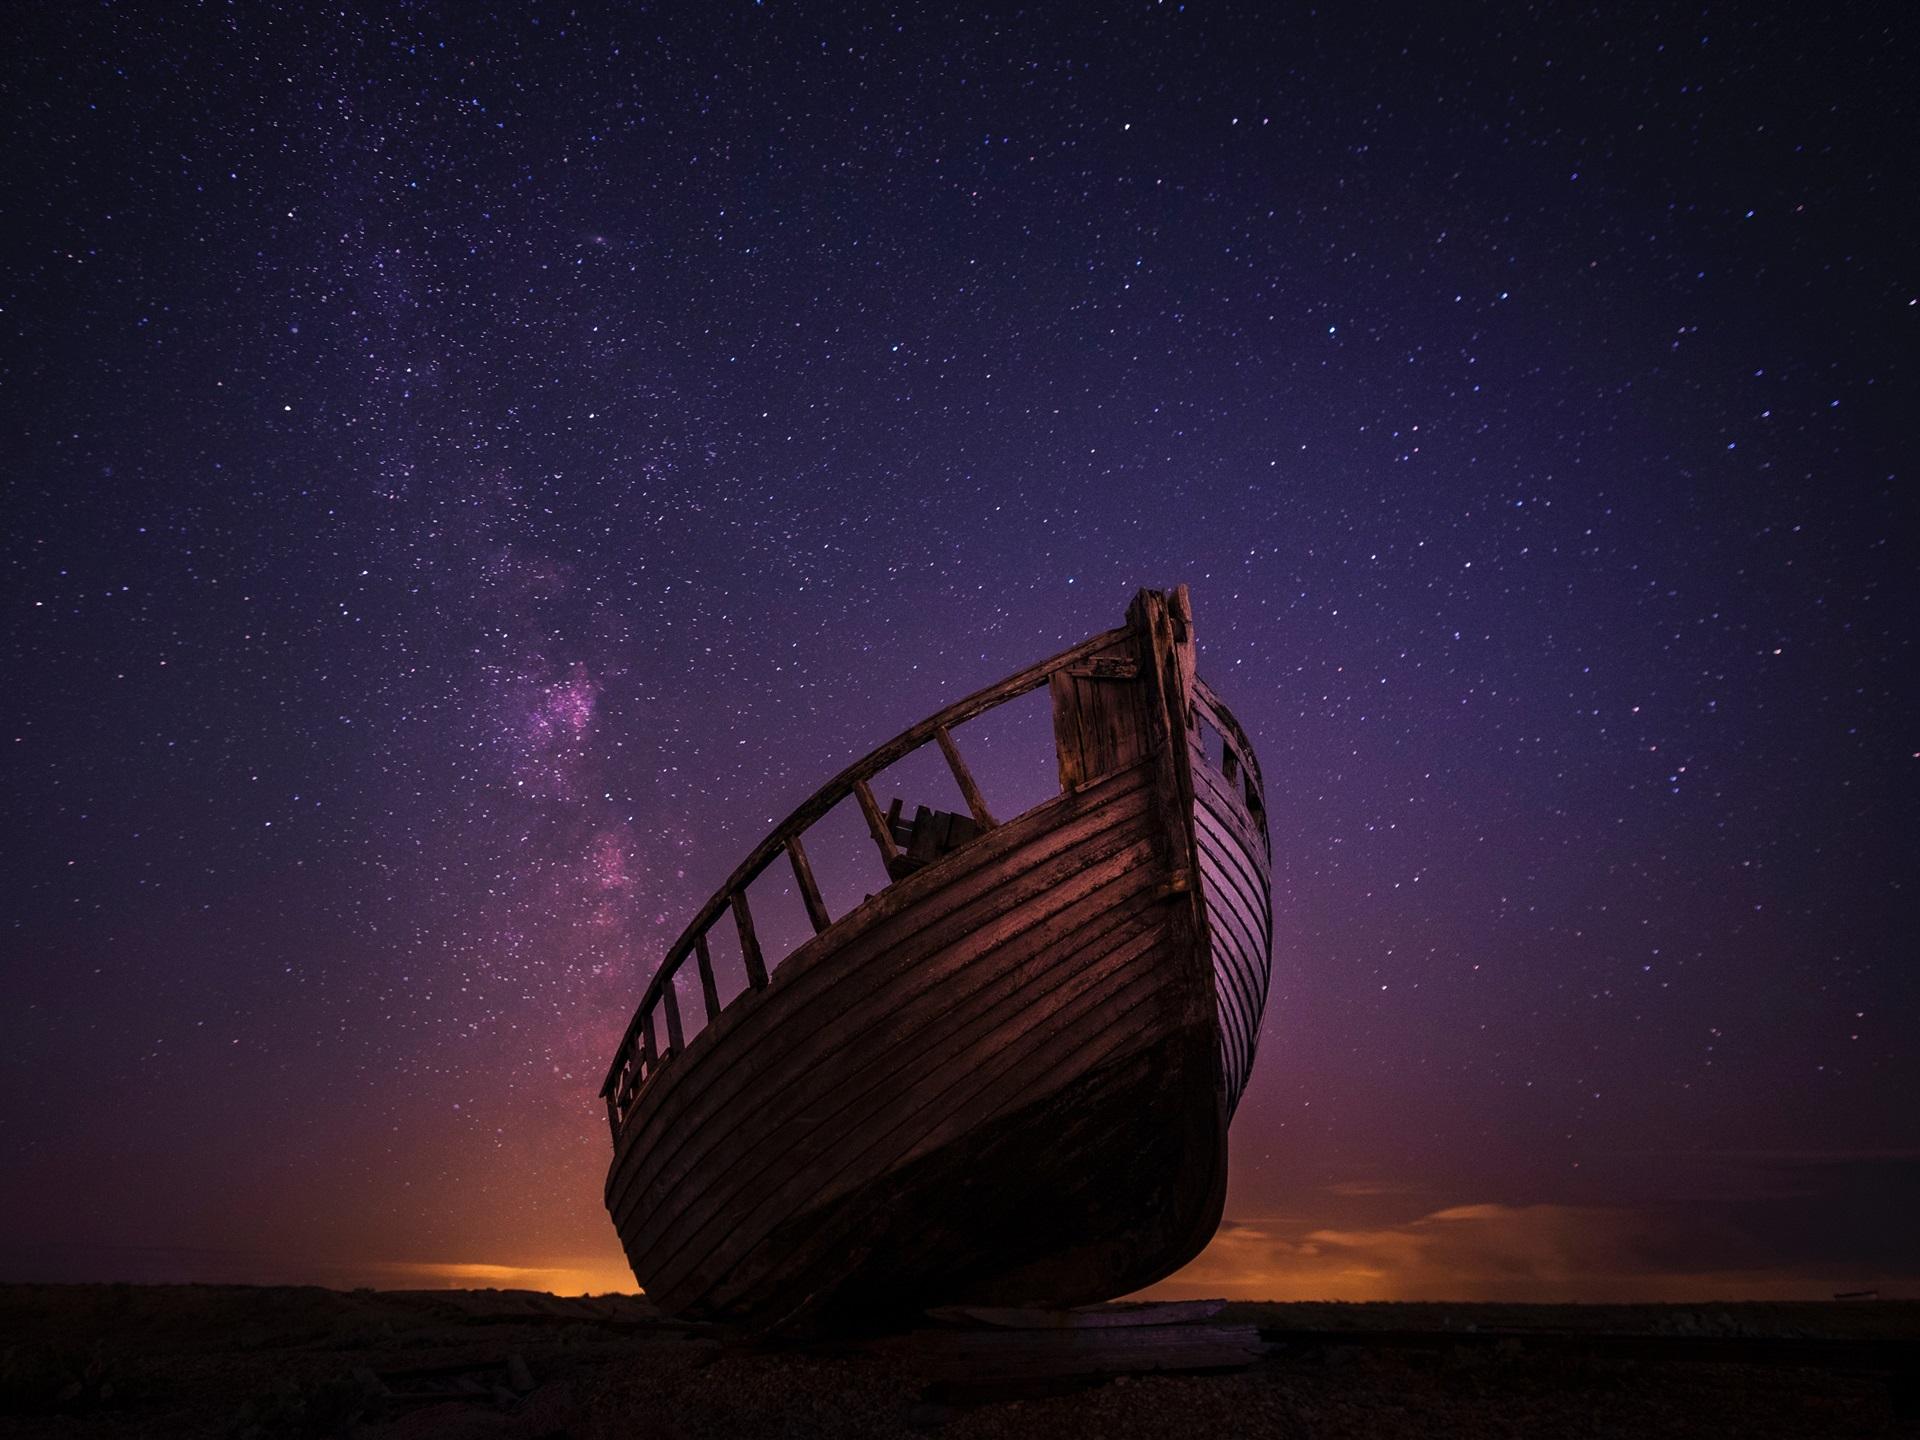 Wallpaper wood boat starry night sky 3840x2160 uhd 4k - Starry sky 4k ...